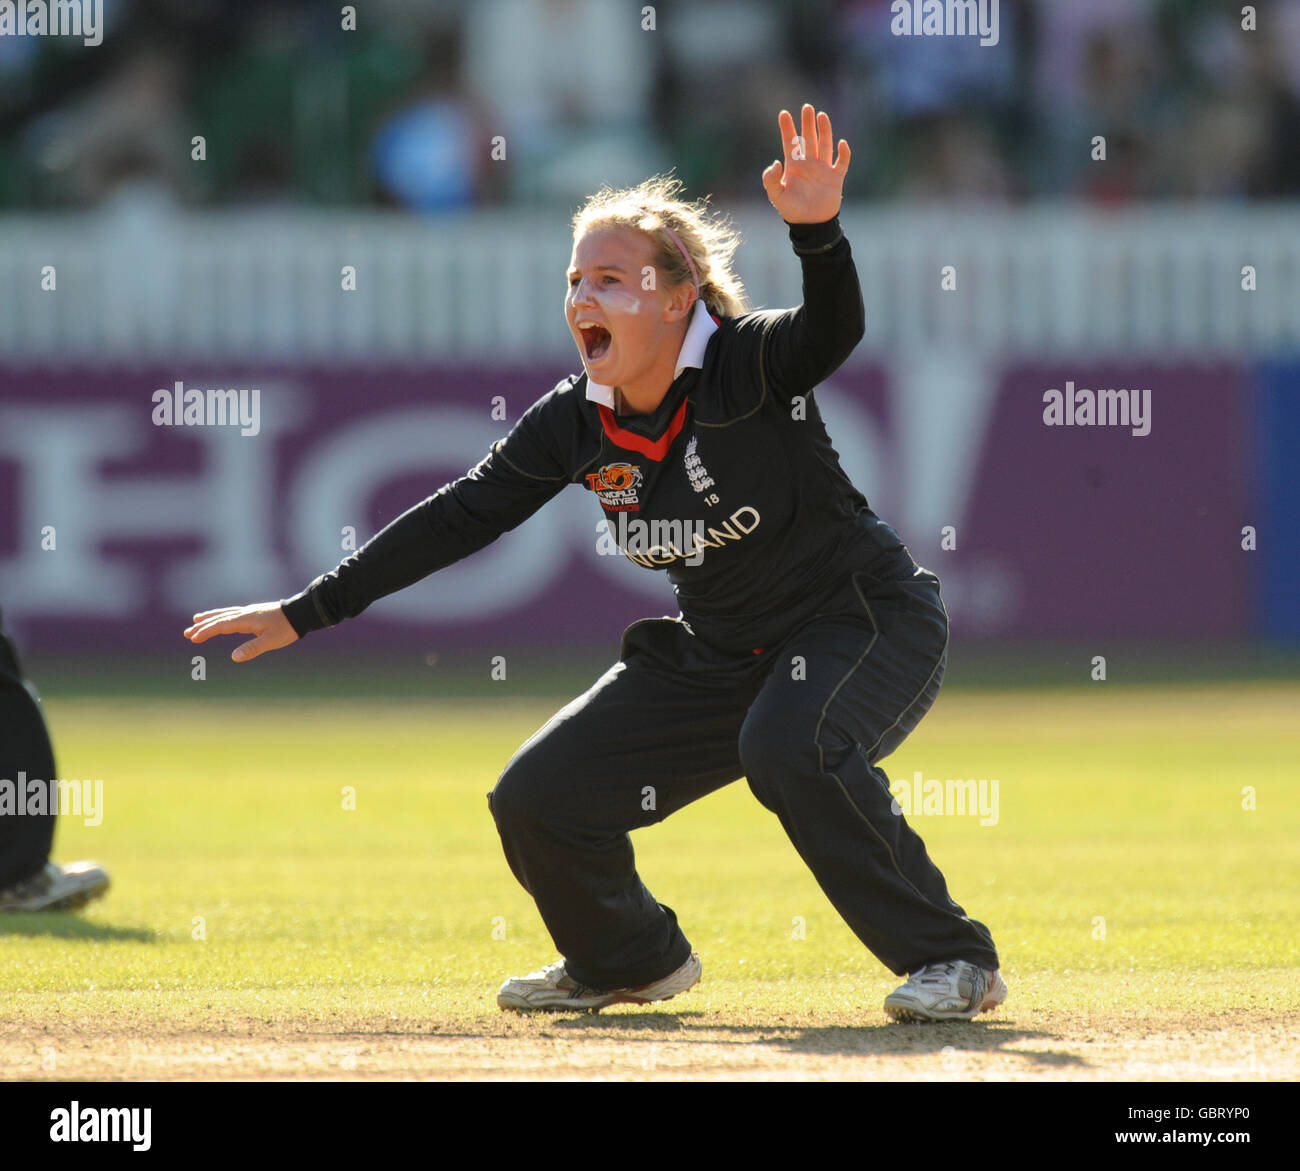 Cricket - ICC Women's World Twenty20 Cup 2009 - England v Pakistan - Taunton - Stock Image